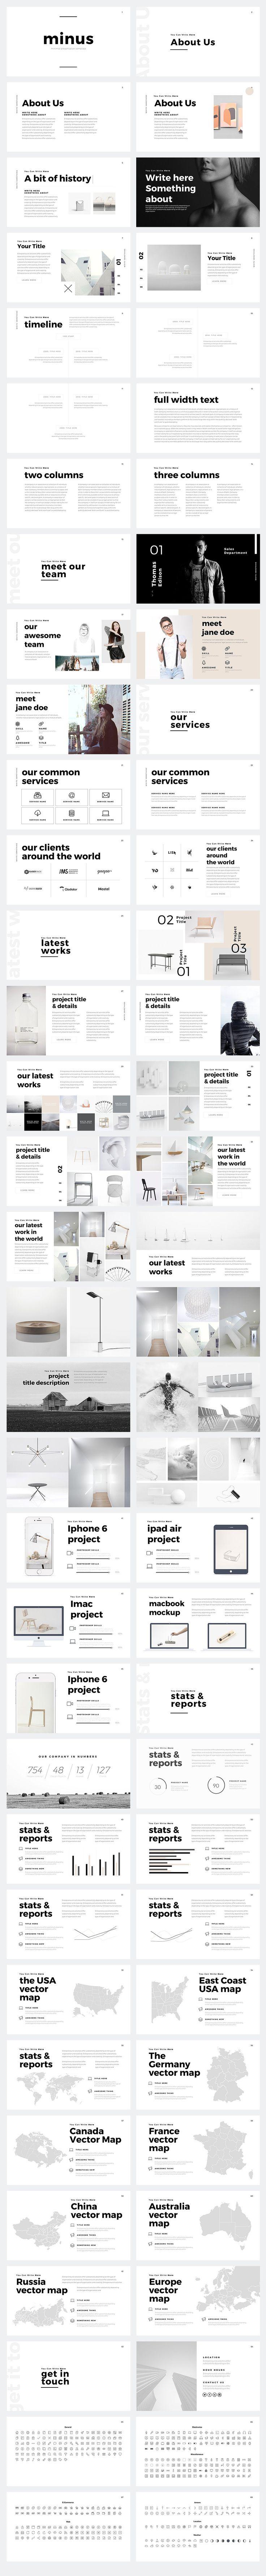 Minus Minimal PowerPoint Template by Slidedizer on @creativemarket